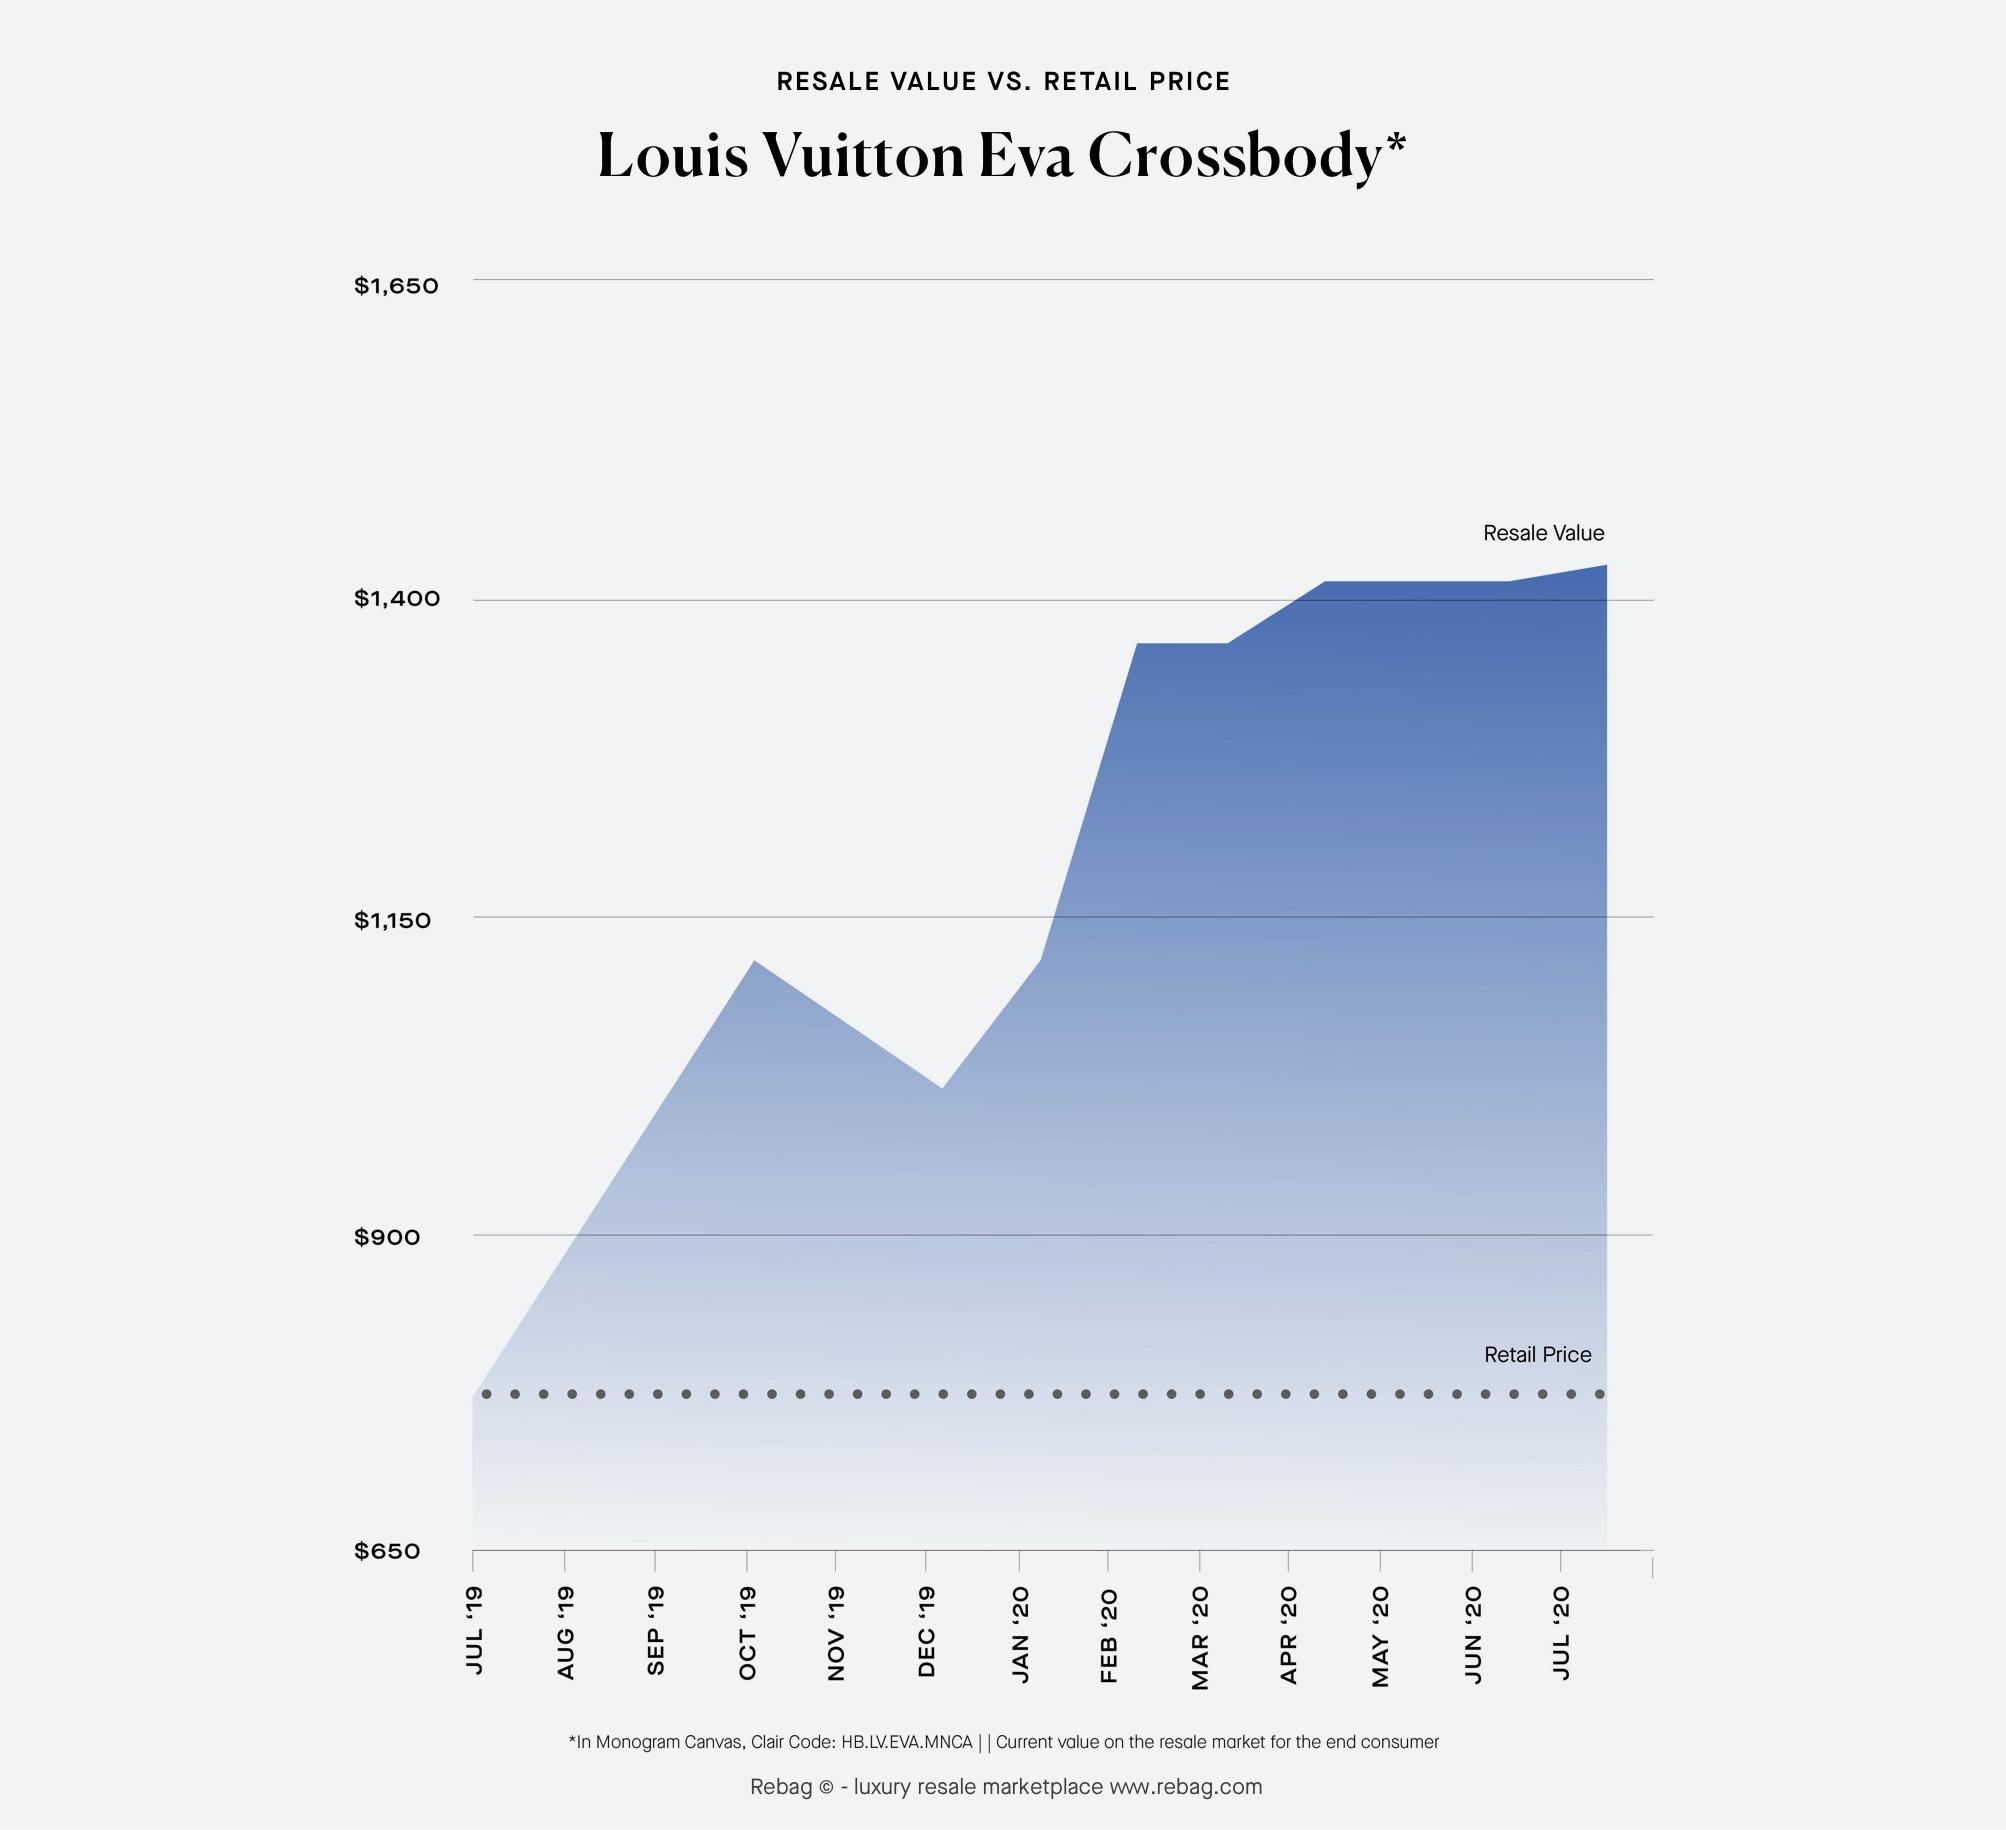 Louis Vuitton Eva Crossbody Resale Value and Retail Price evolution